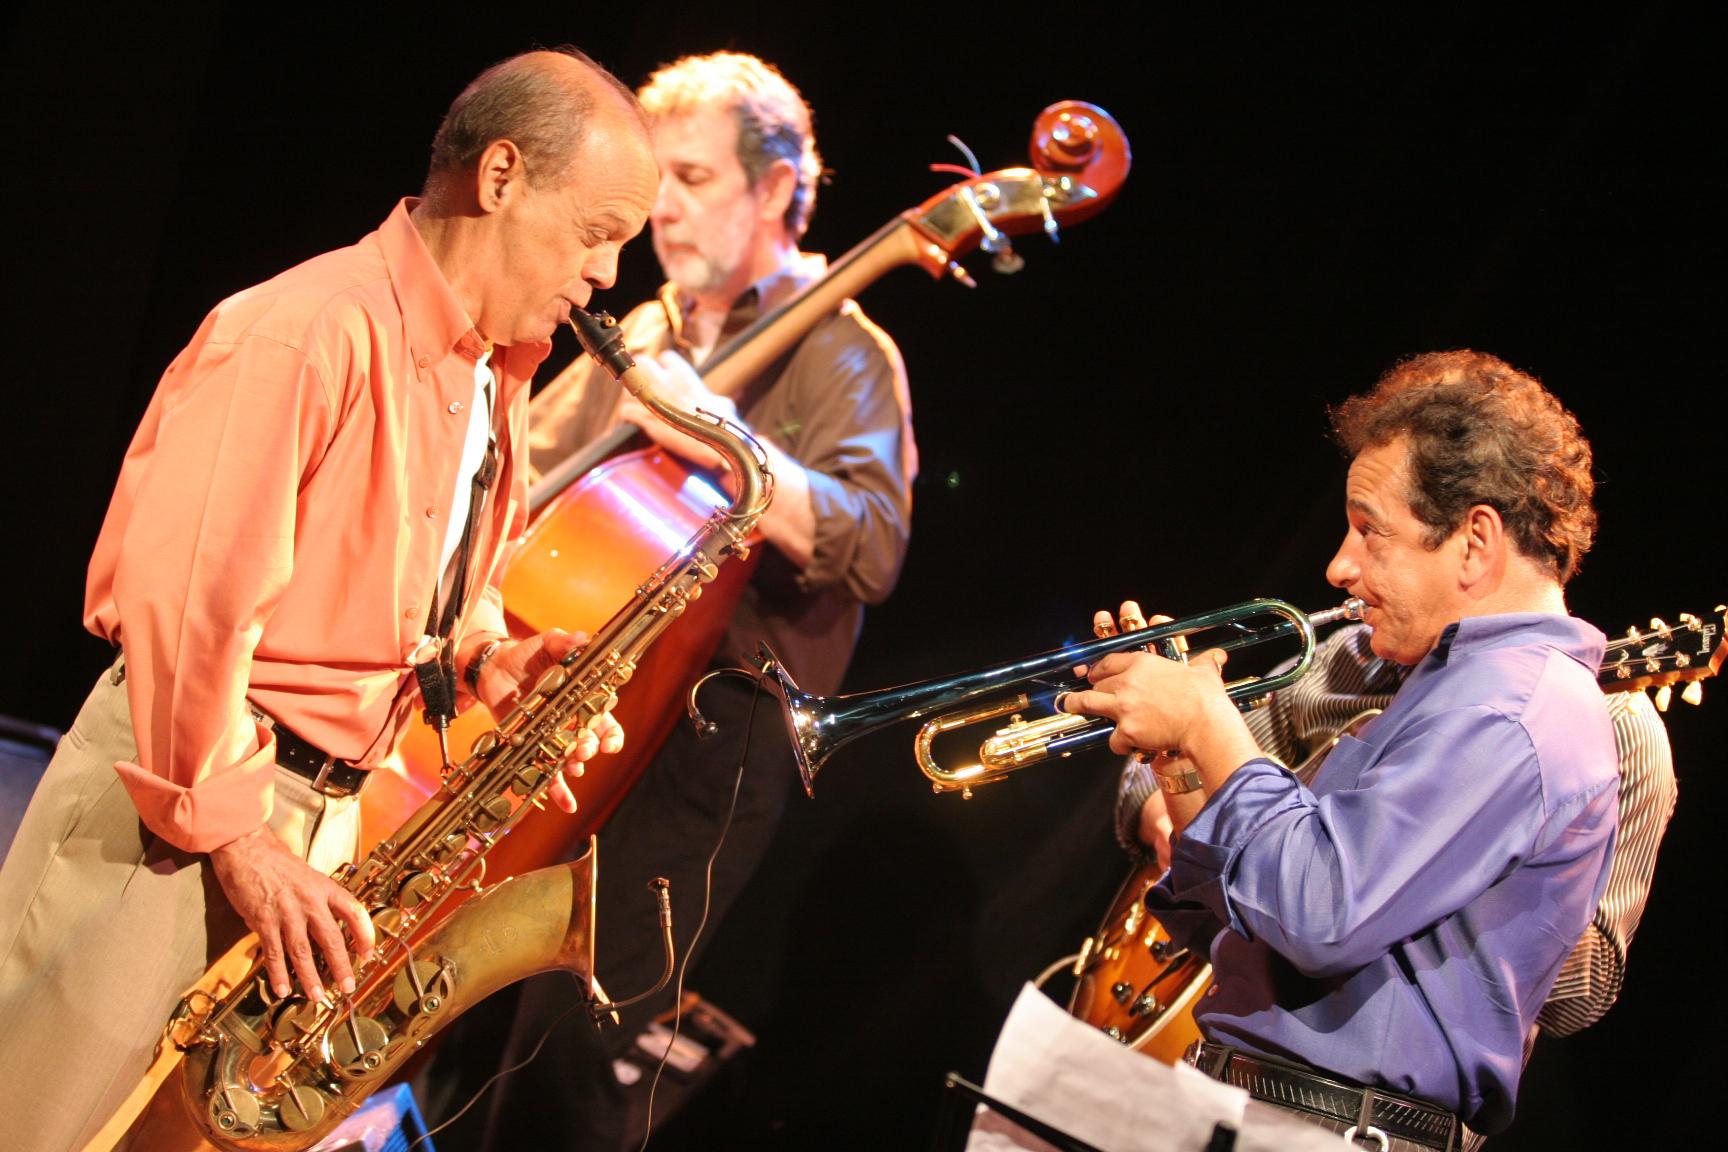 RioJazz 2007